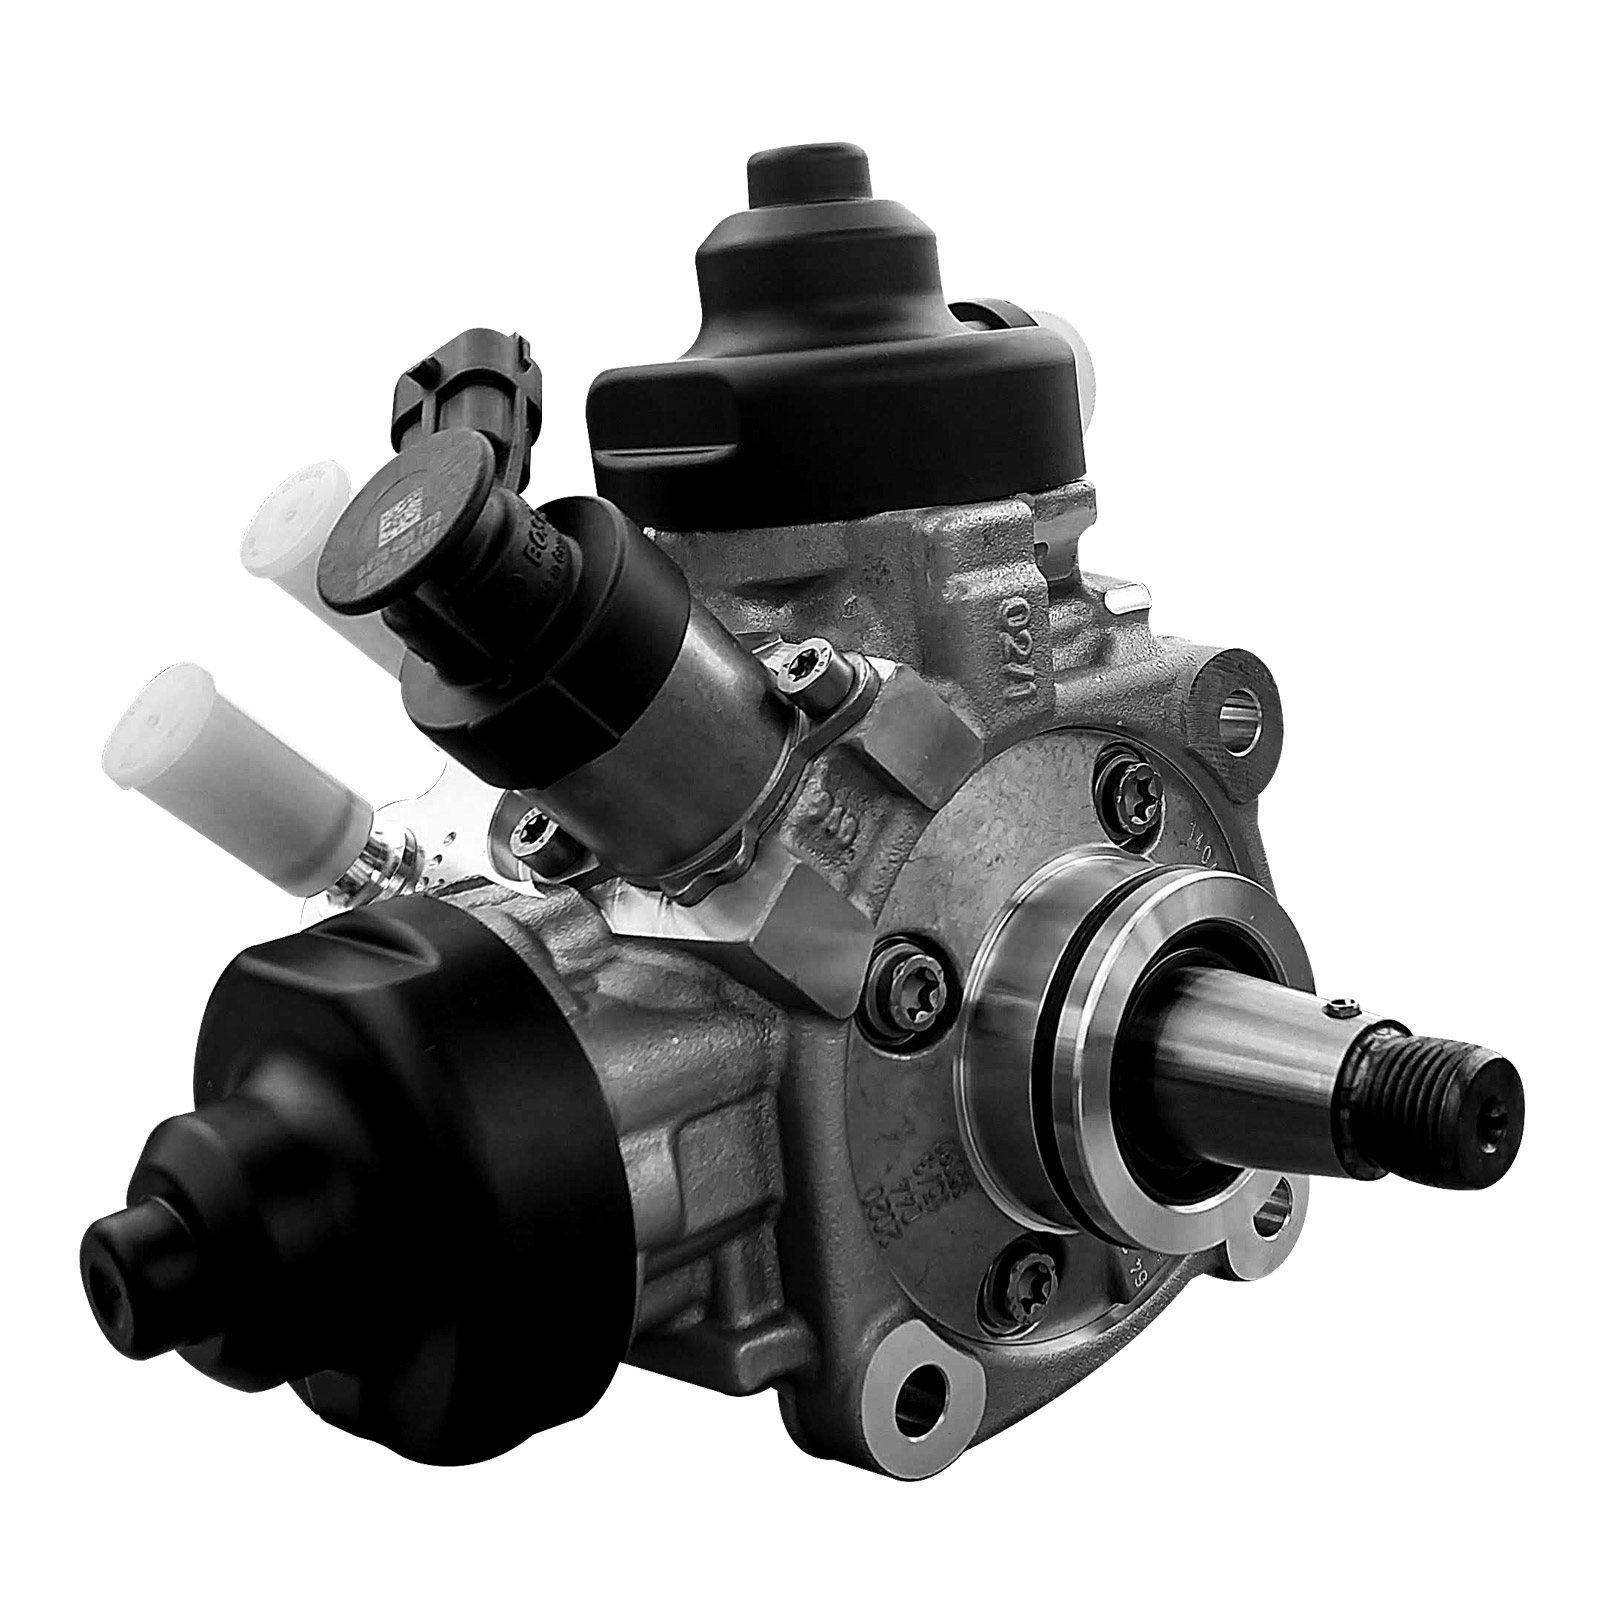 Bomba de Alta Pressão  Jeep Grand Cherokee Limited 3.0 V6 Diesel  CRDI 4X4 Nova Original Bosch